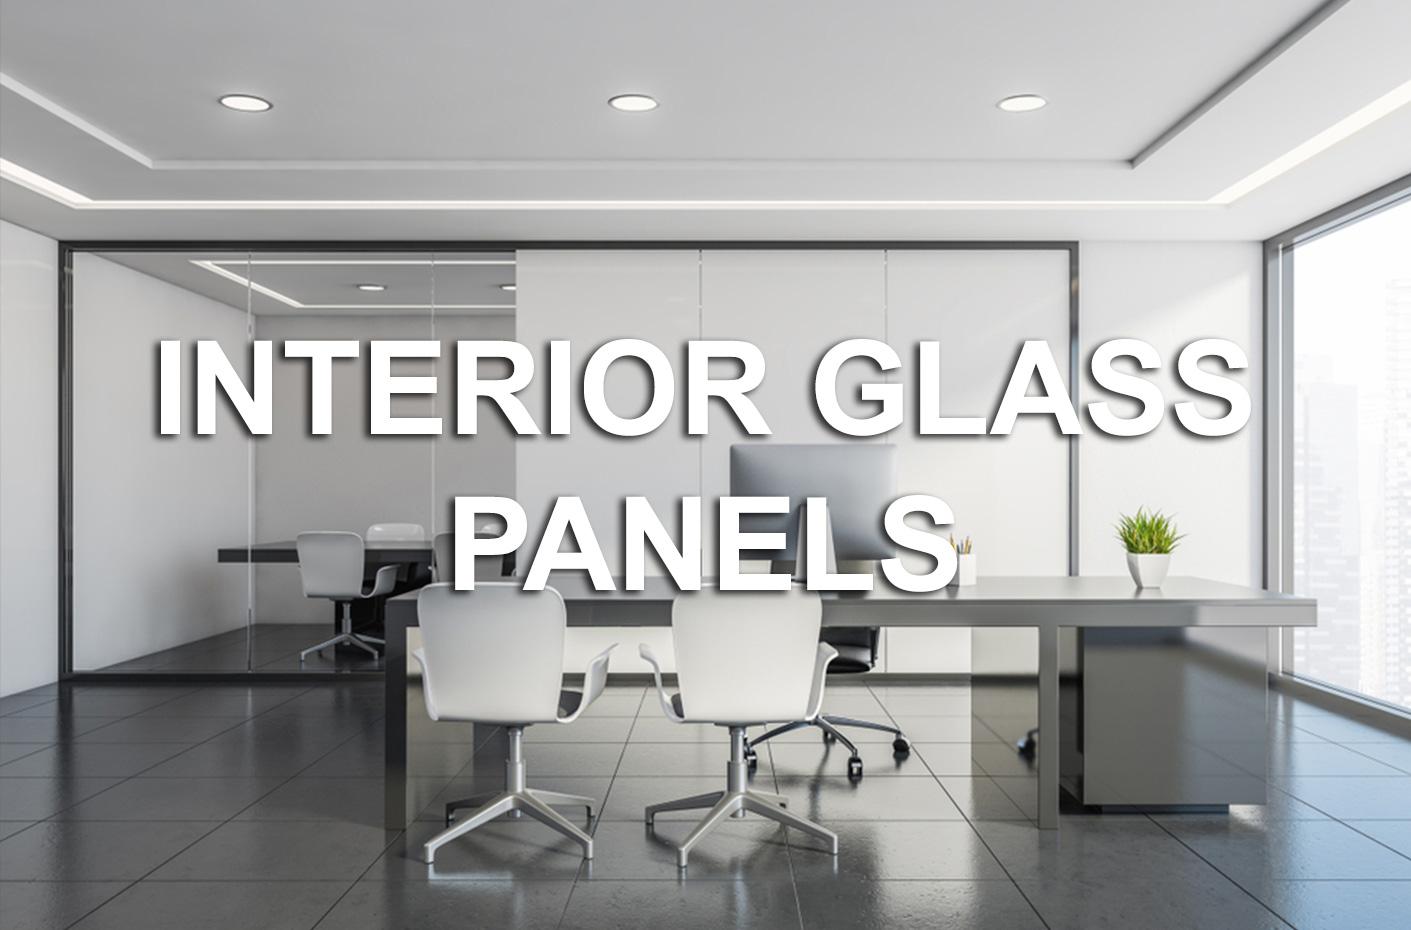 INTERIOR-GLASS-PANELS-TEXT